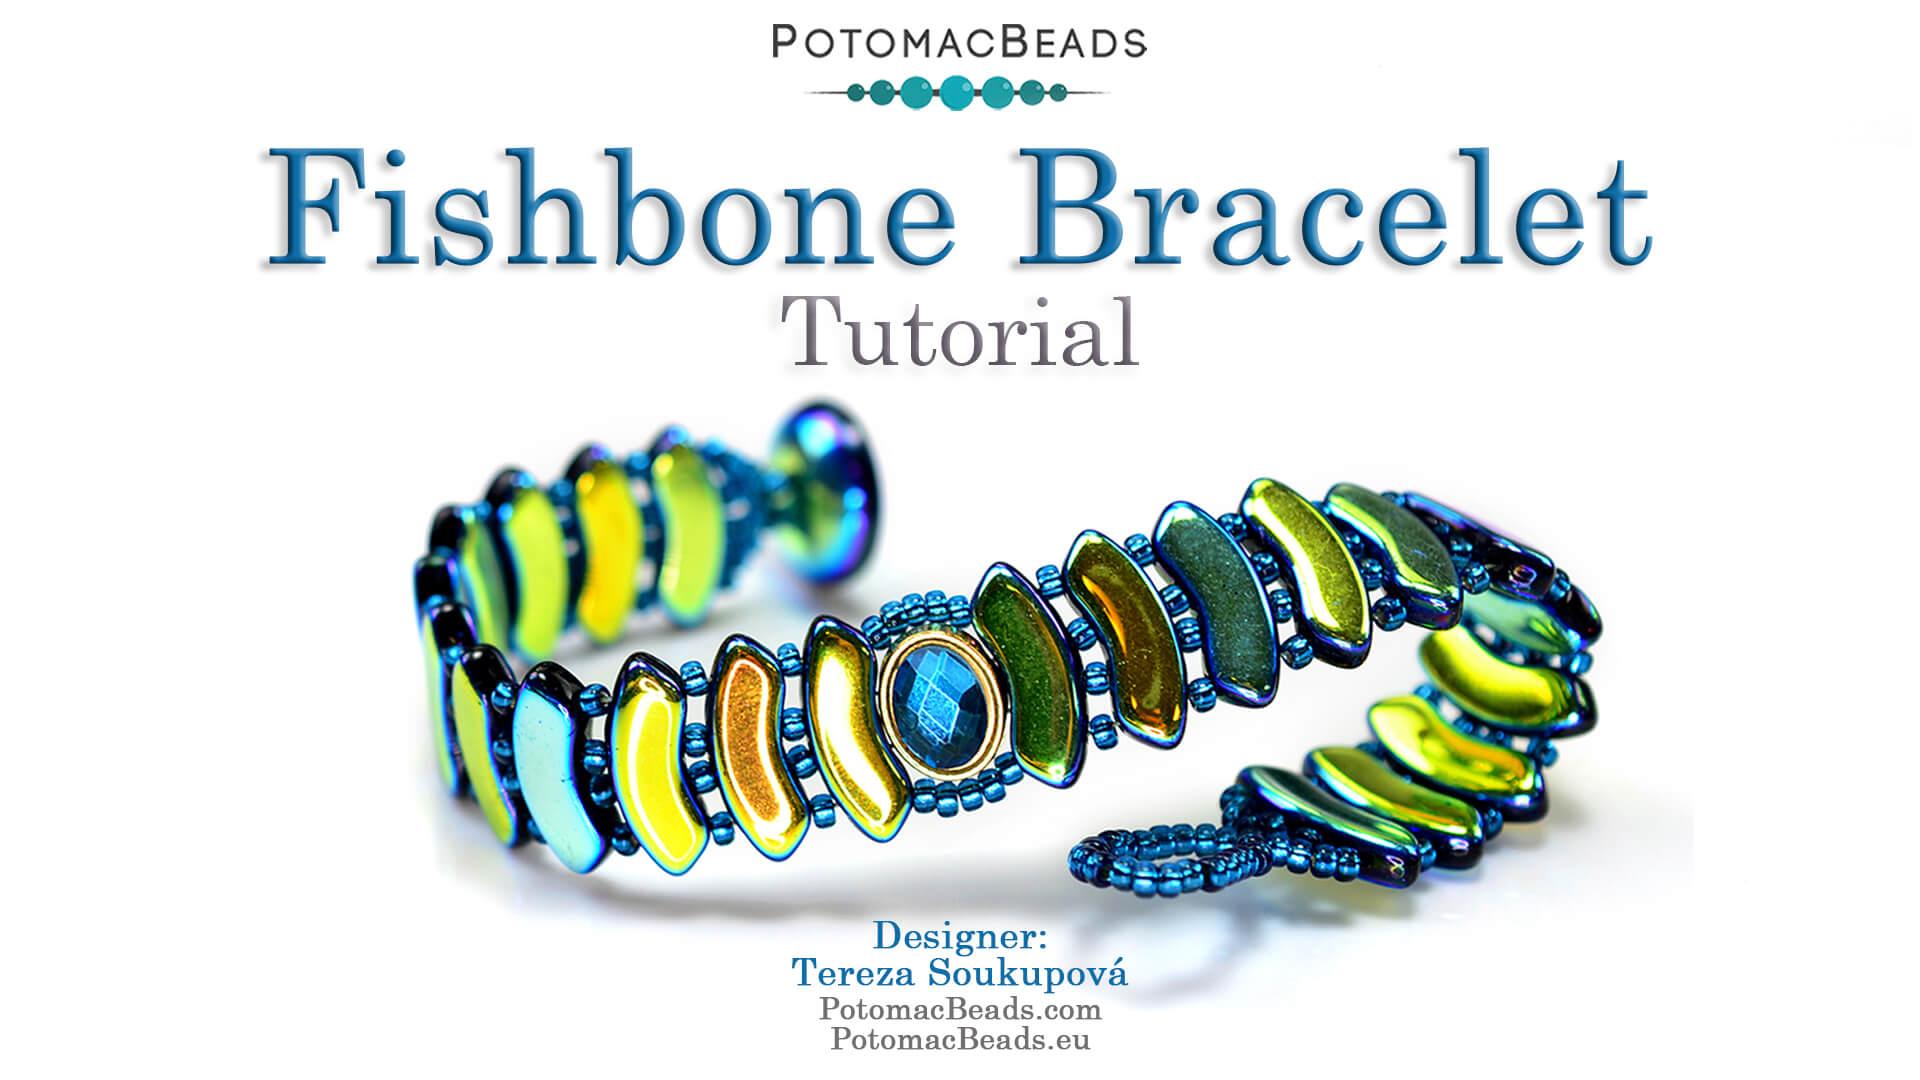 How to Bead / Videos Sorted by Beads / QuadBow & PieDuo Bead Videos / Fishbone Bracelet Tutorial